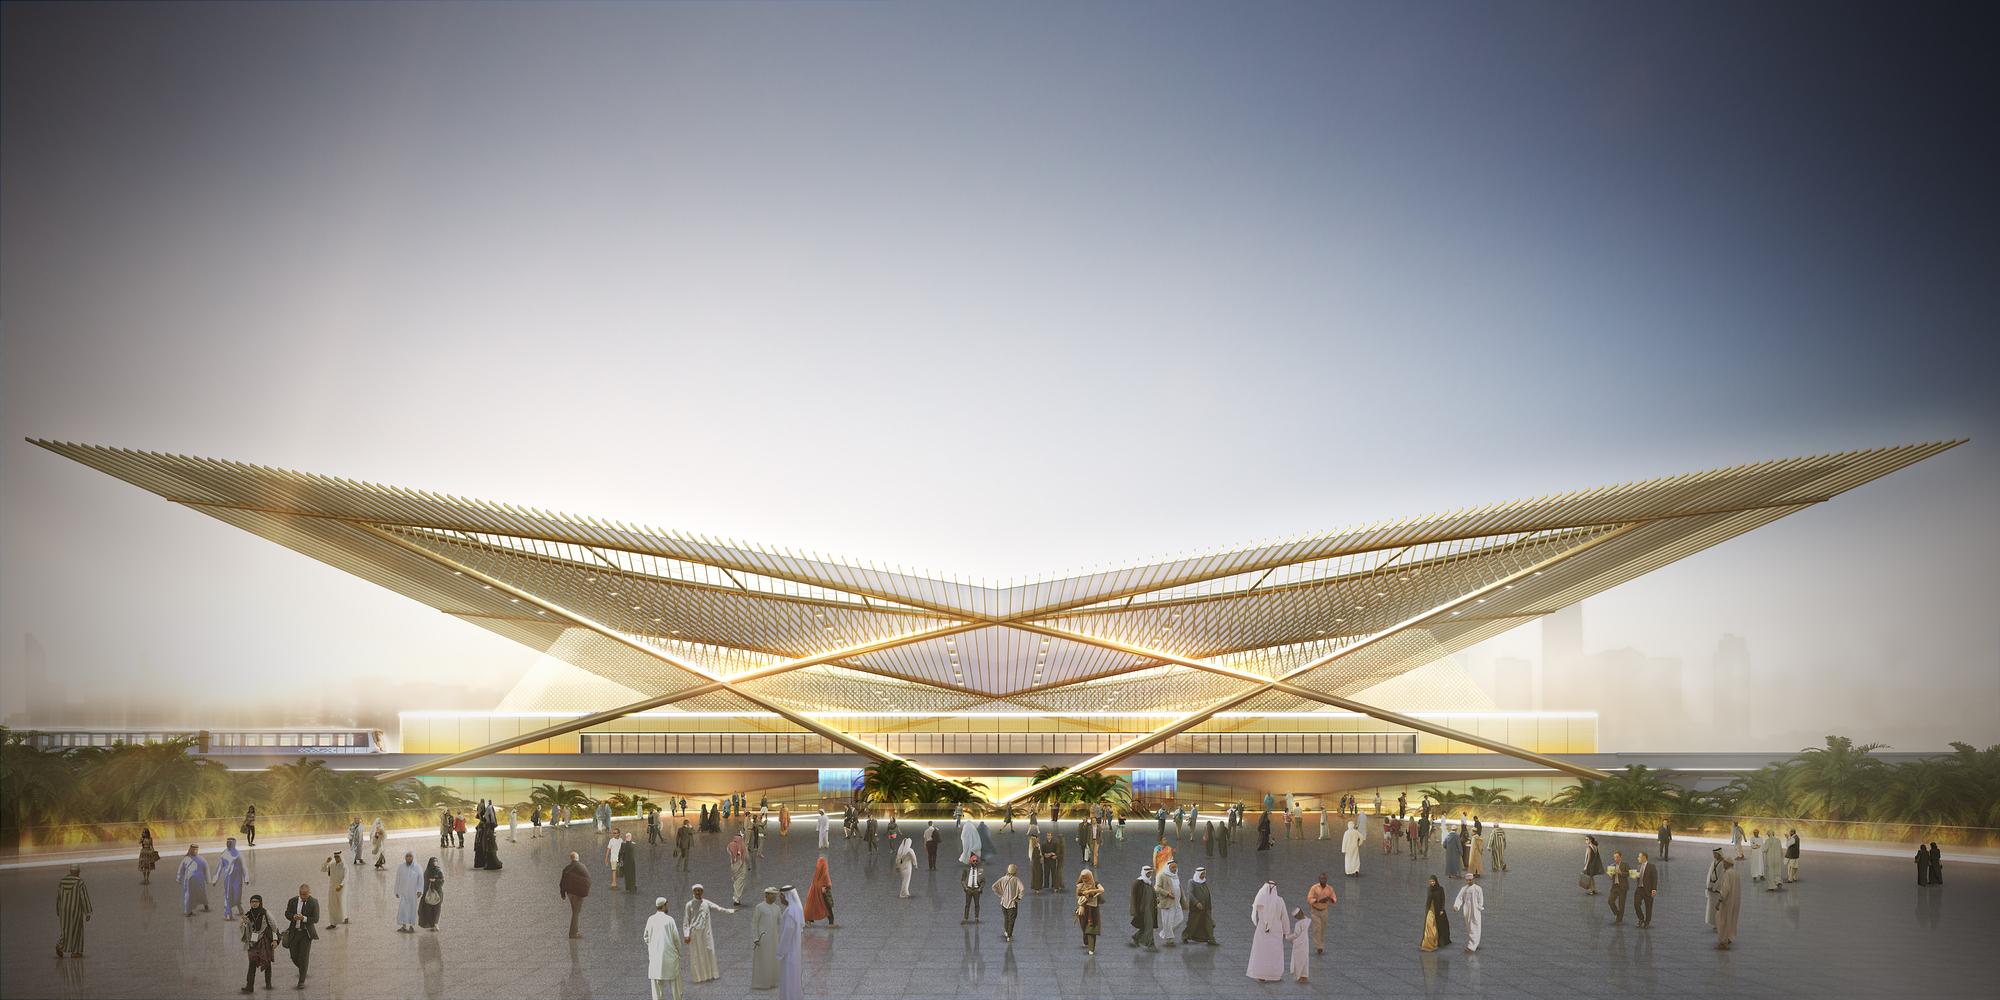 Weston Williamson Partners Wins Competition For Dubai 2020